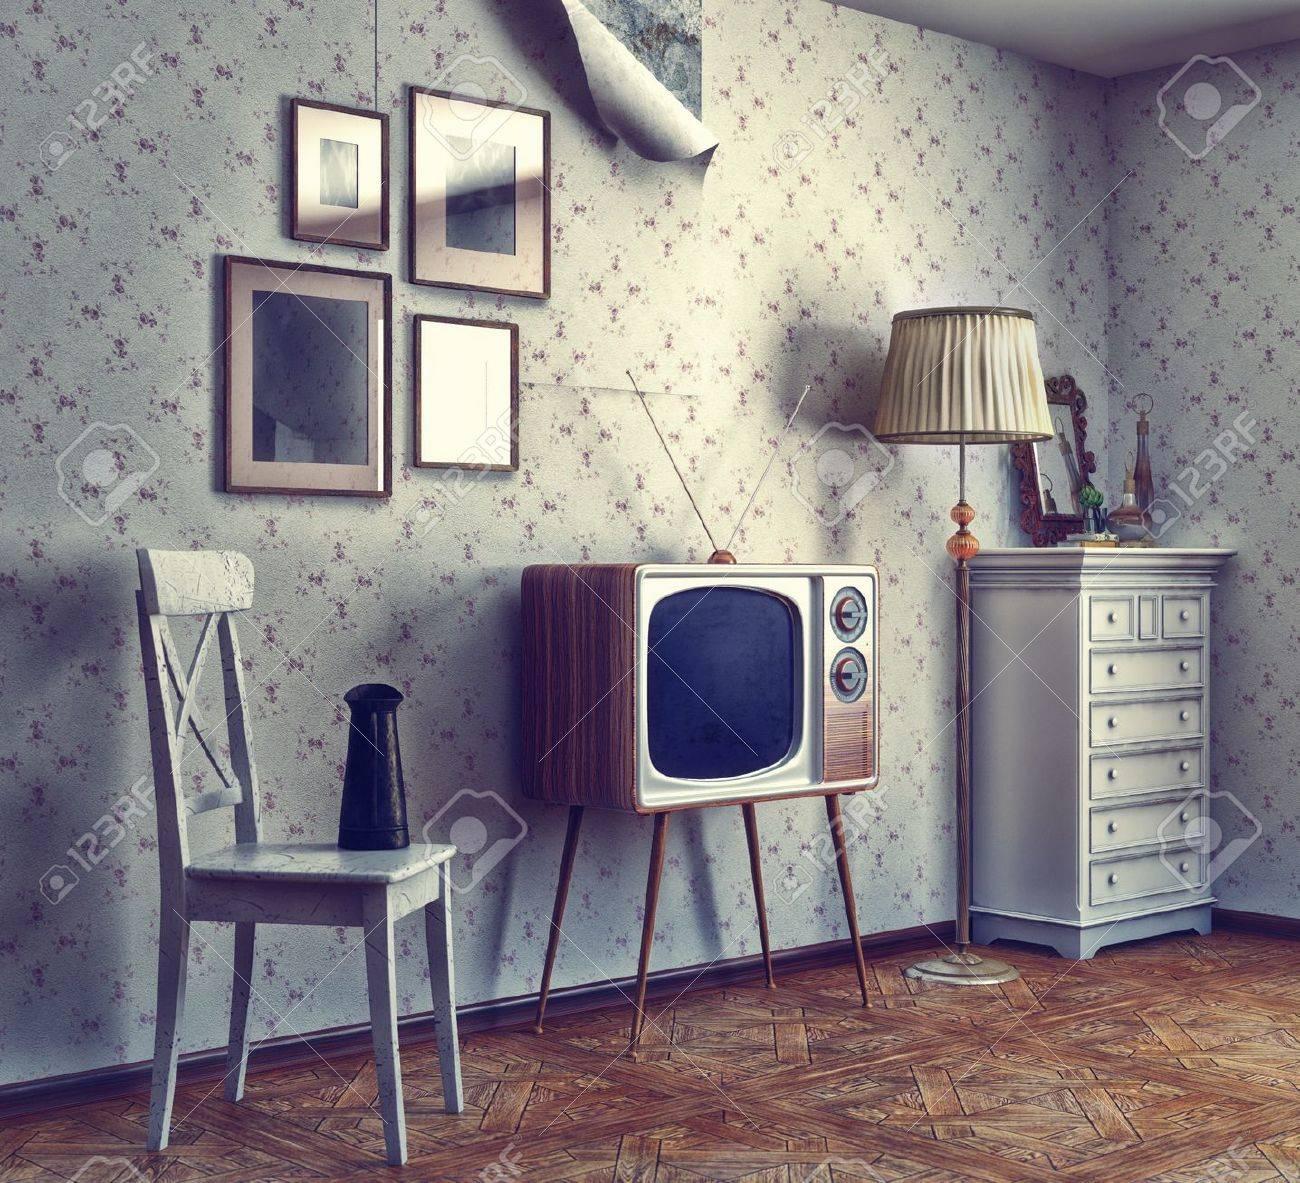 obsolete retro interior  photo and cg elements combinated, texture and grain add Stock Photo - 17693608